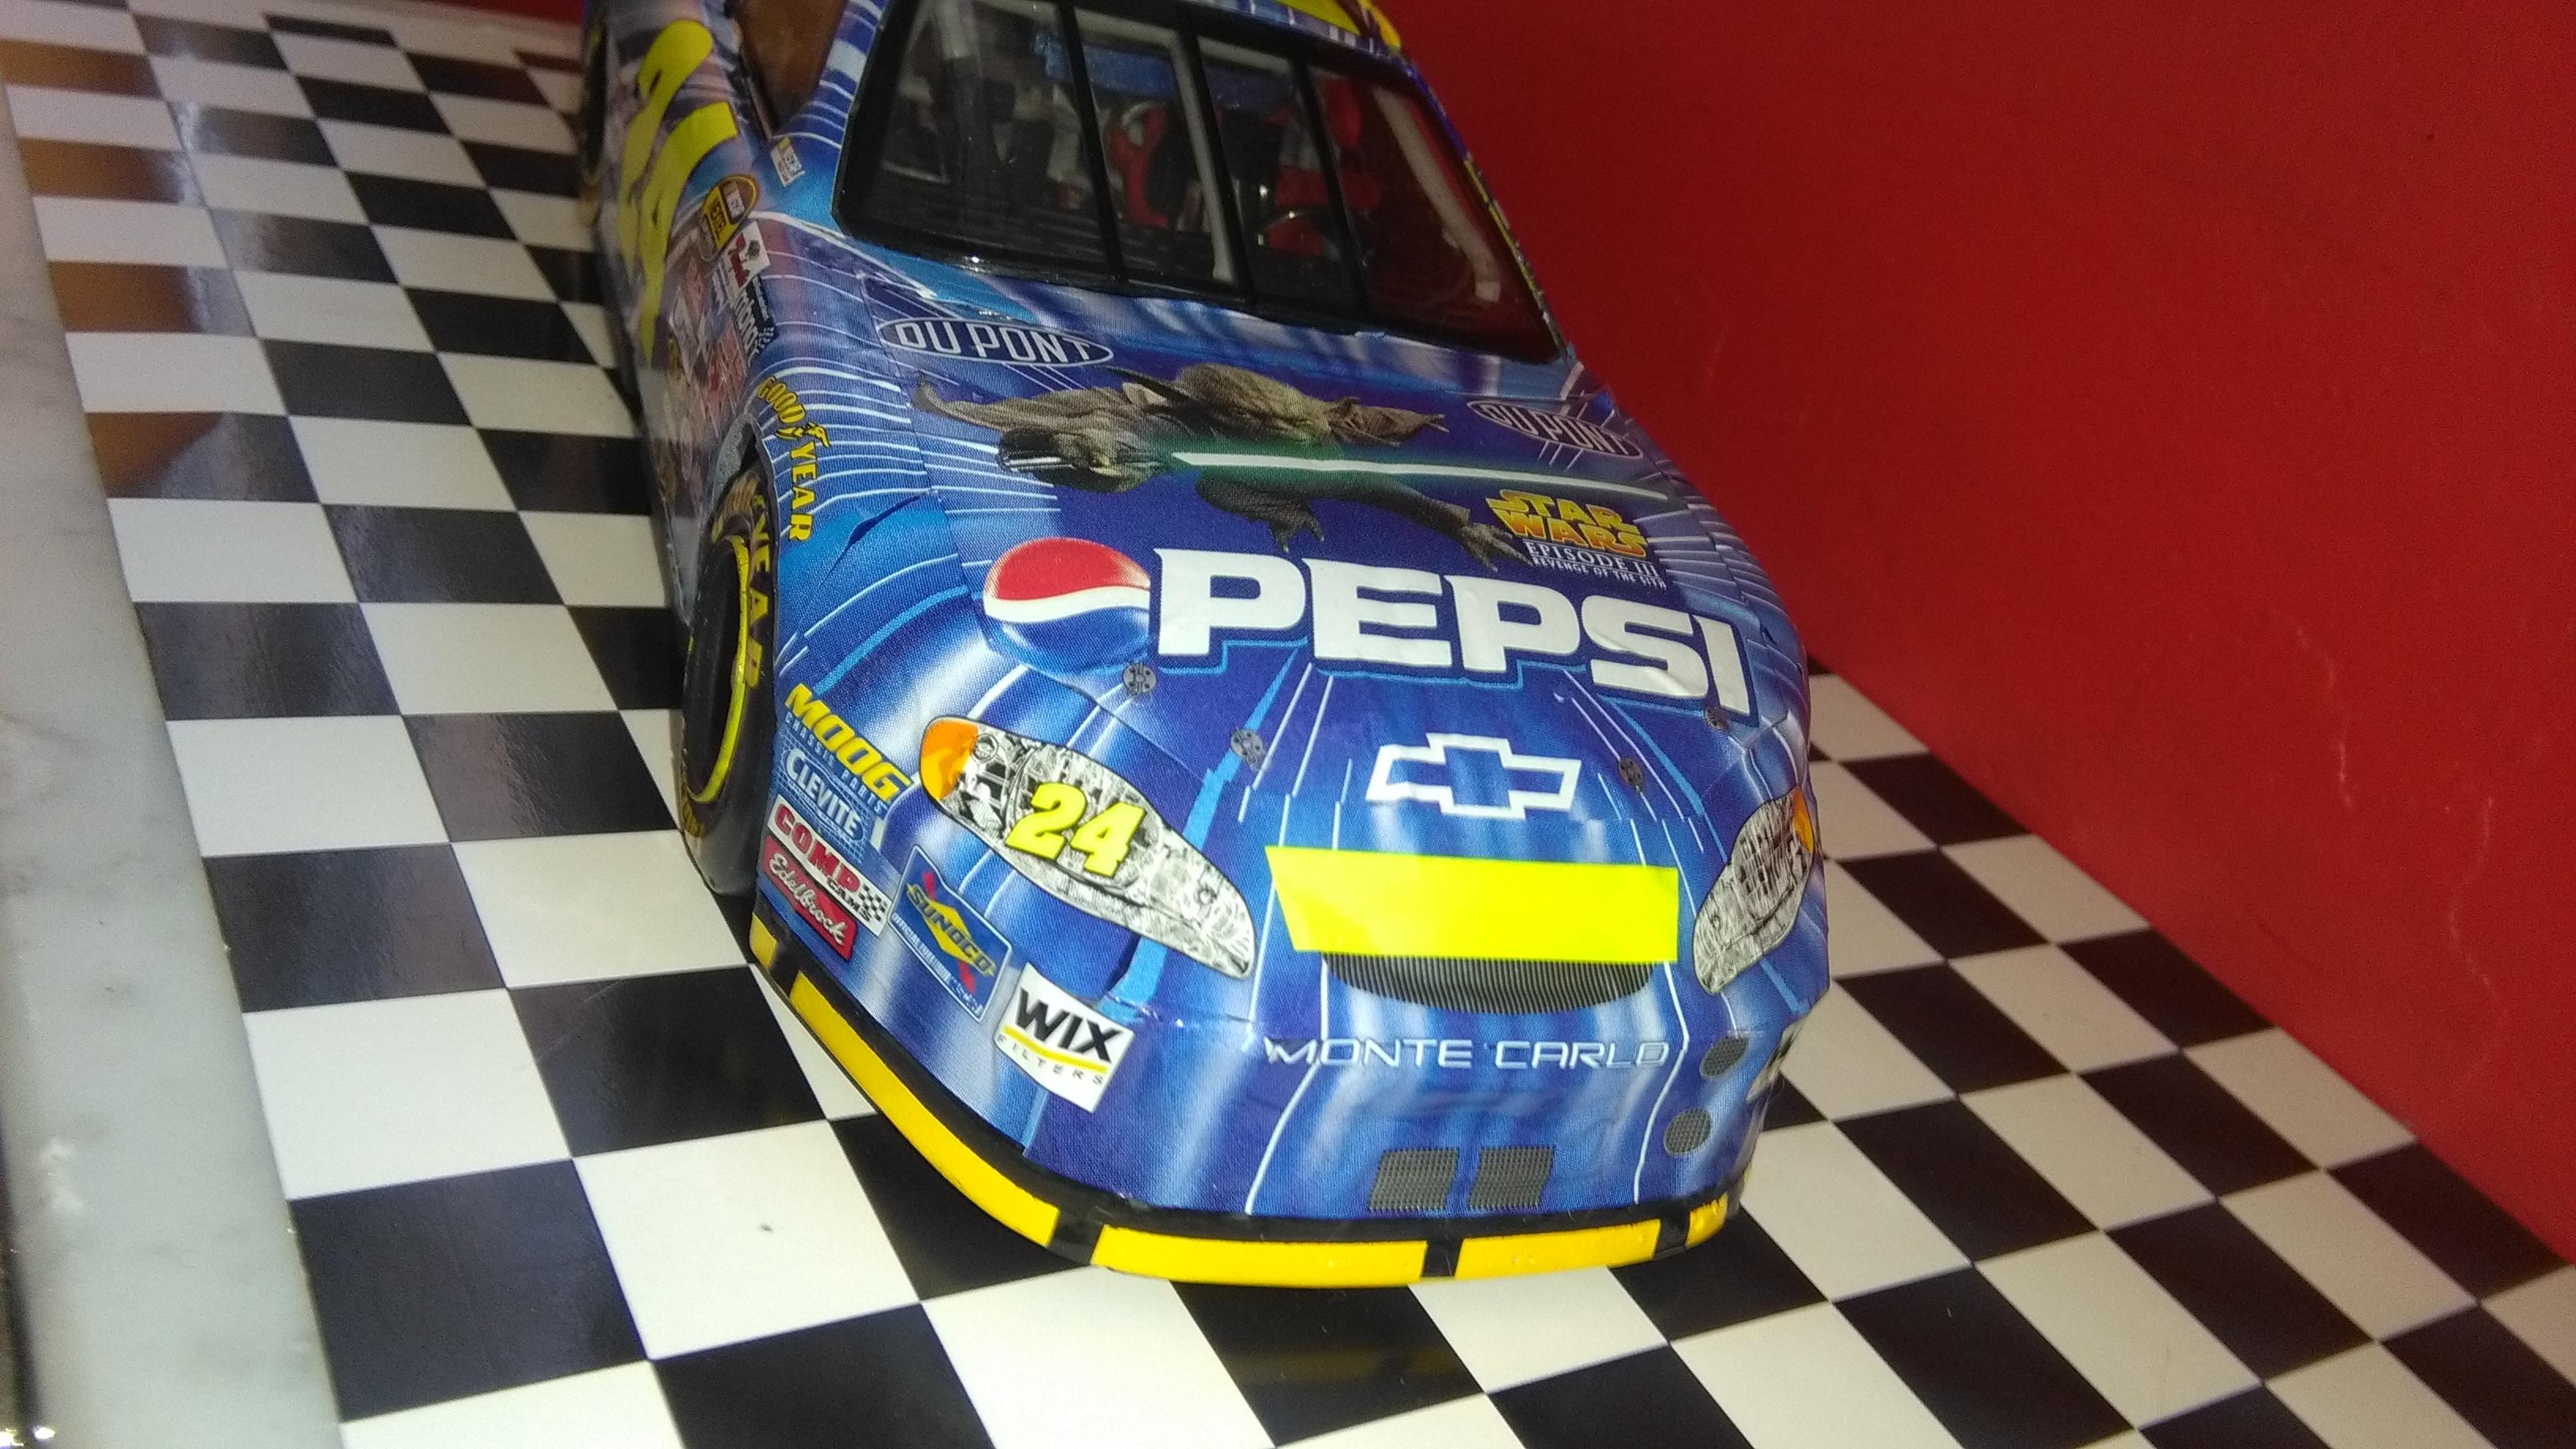 Chevy Monte-Carlo 2005 #24 Jeff Gordon Pepsi/Star Wars  235357IMG20170430170111